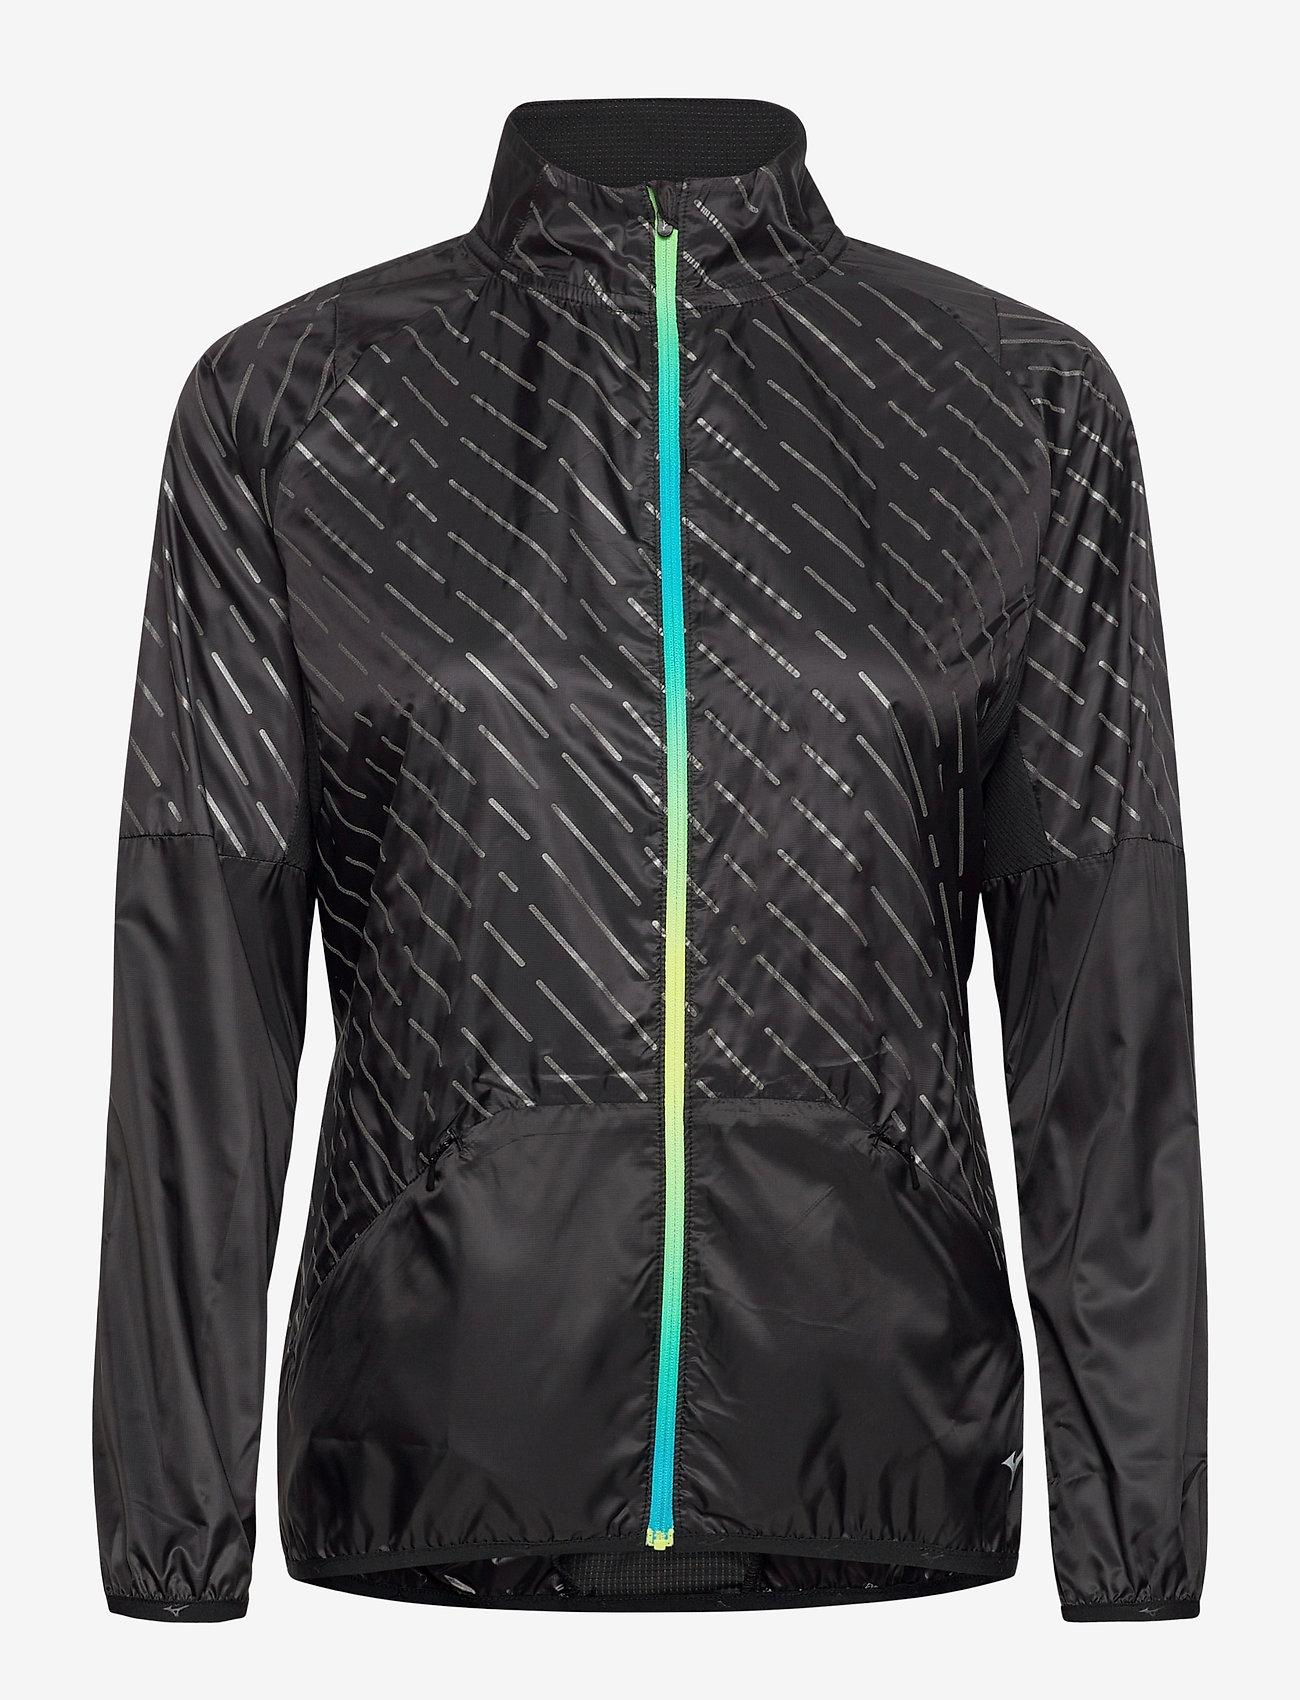 Reflect Wind Jacket (Black) (67.50 €) - Mizuno 05N12